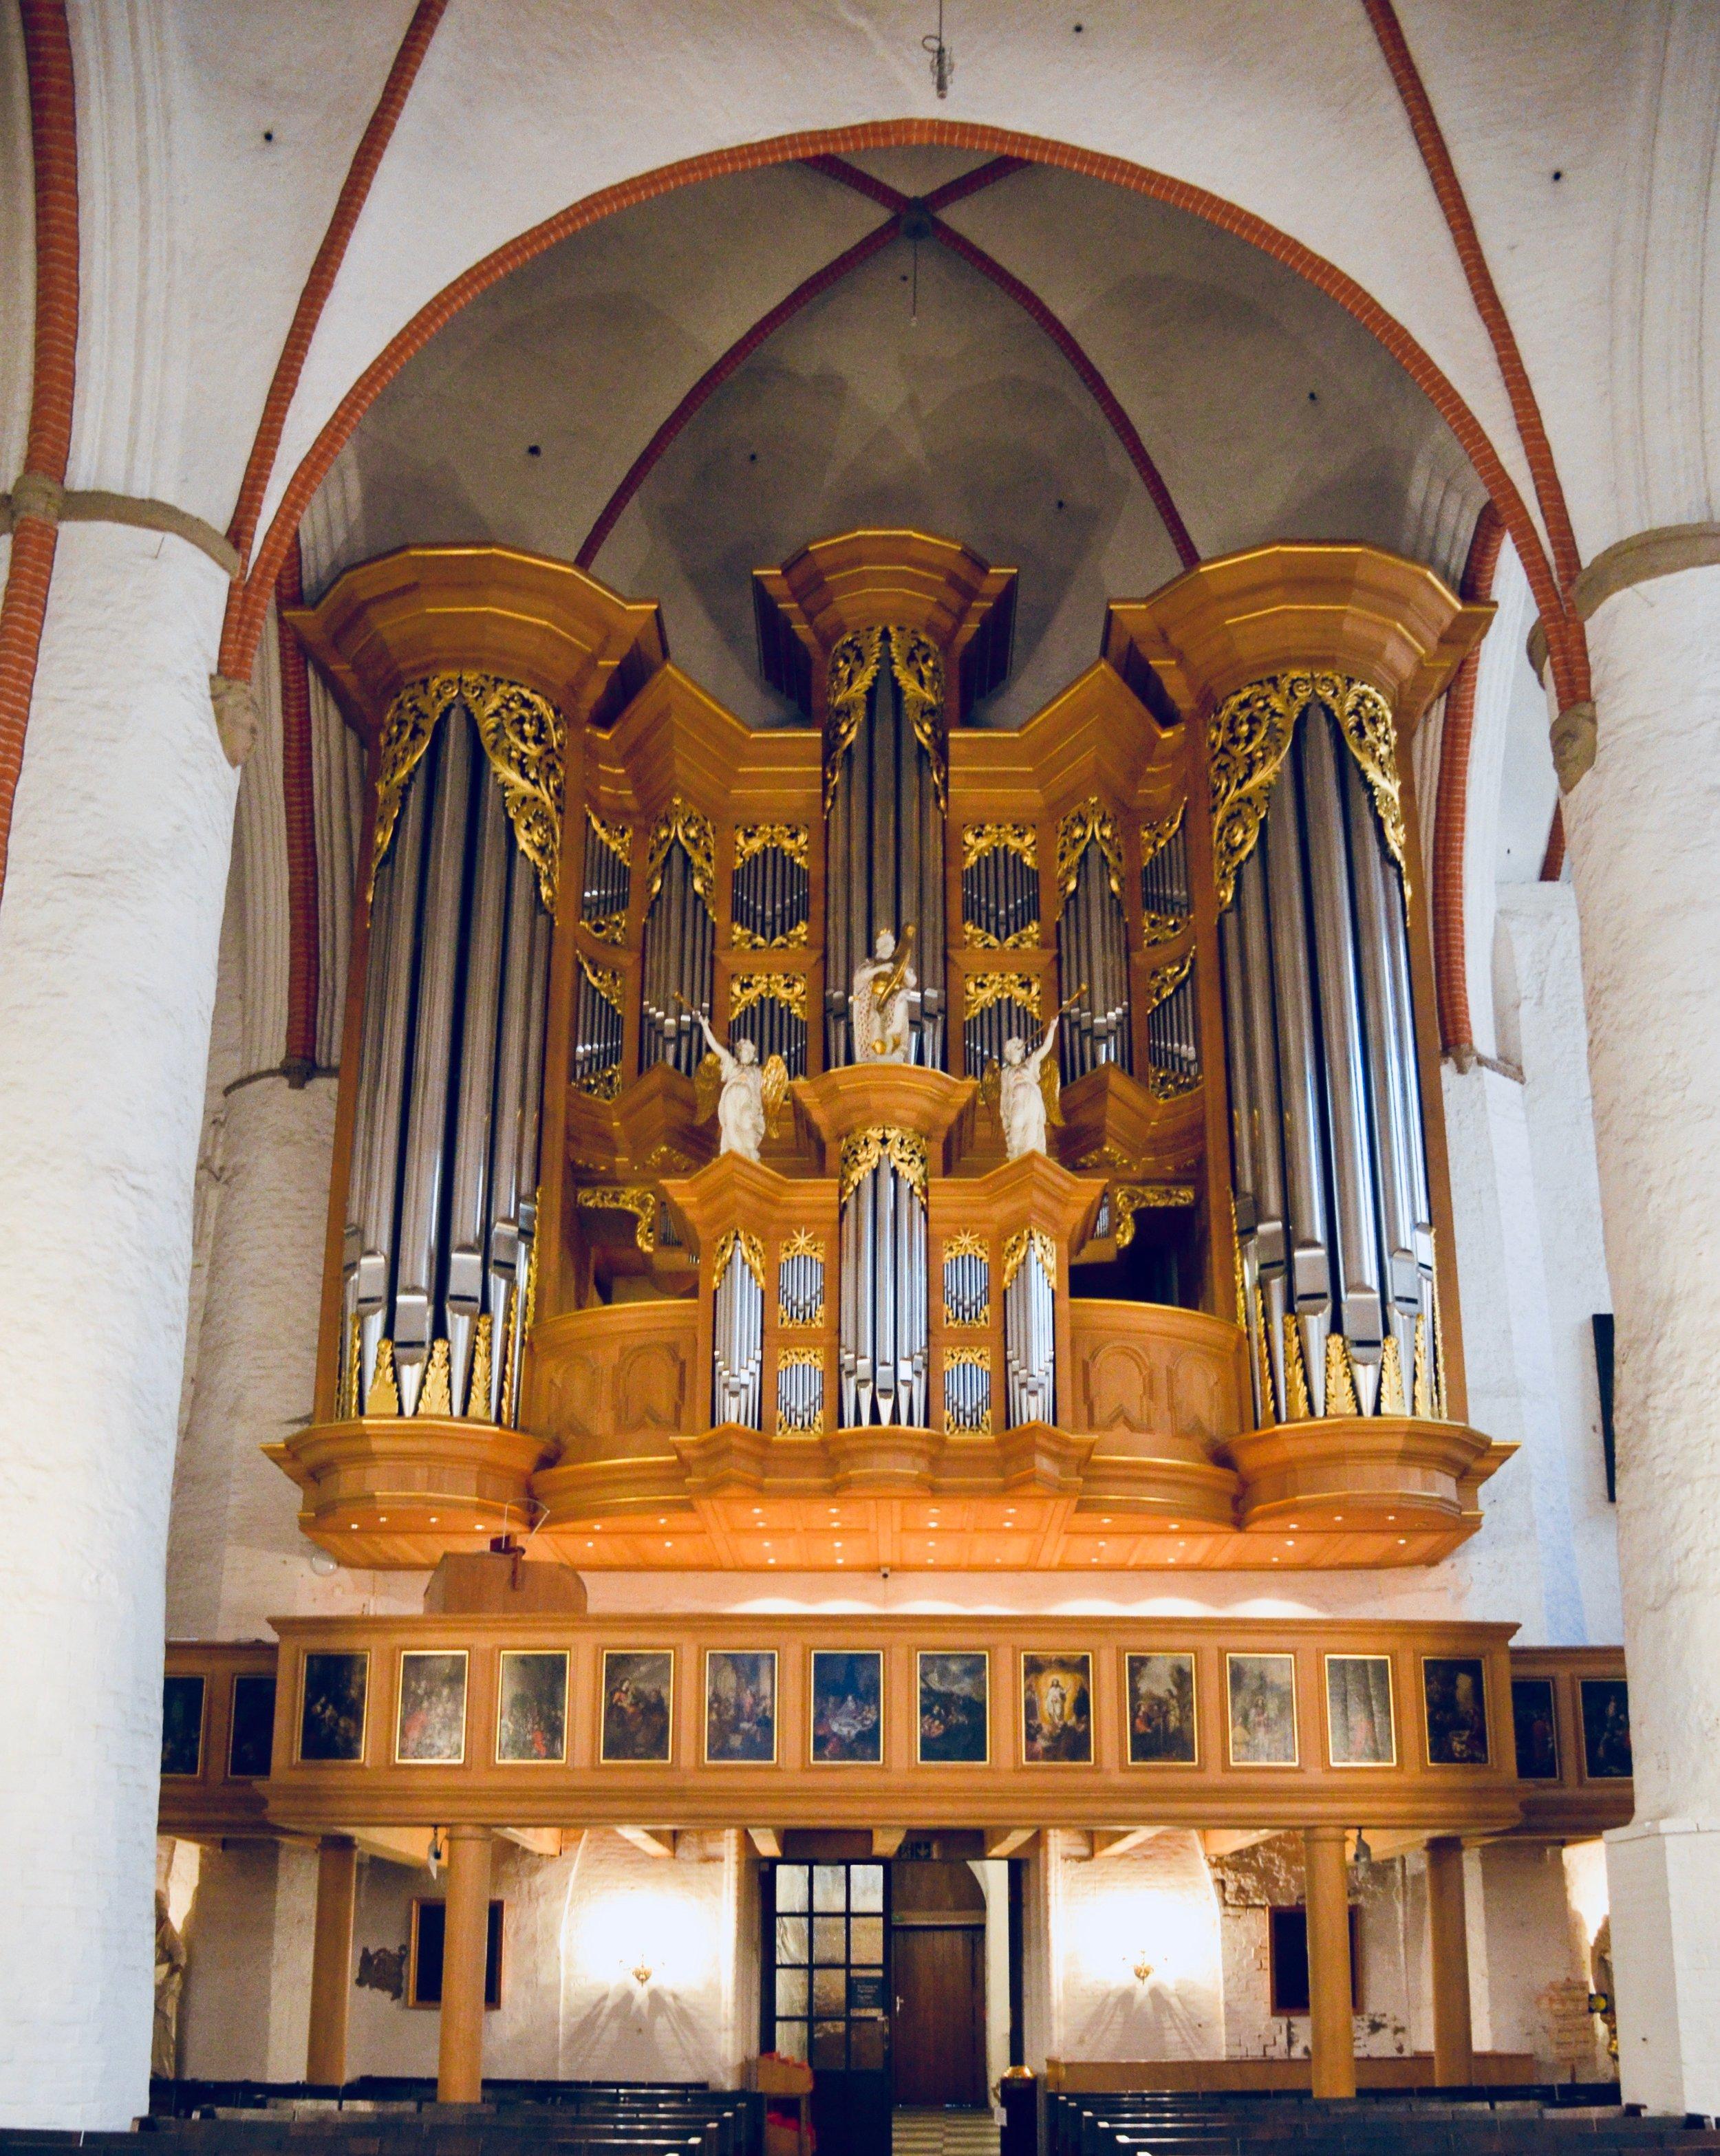 1693 Arp Schnitger organ in St. Jacobi, Hamburg